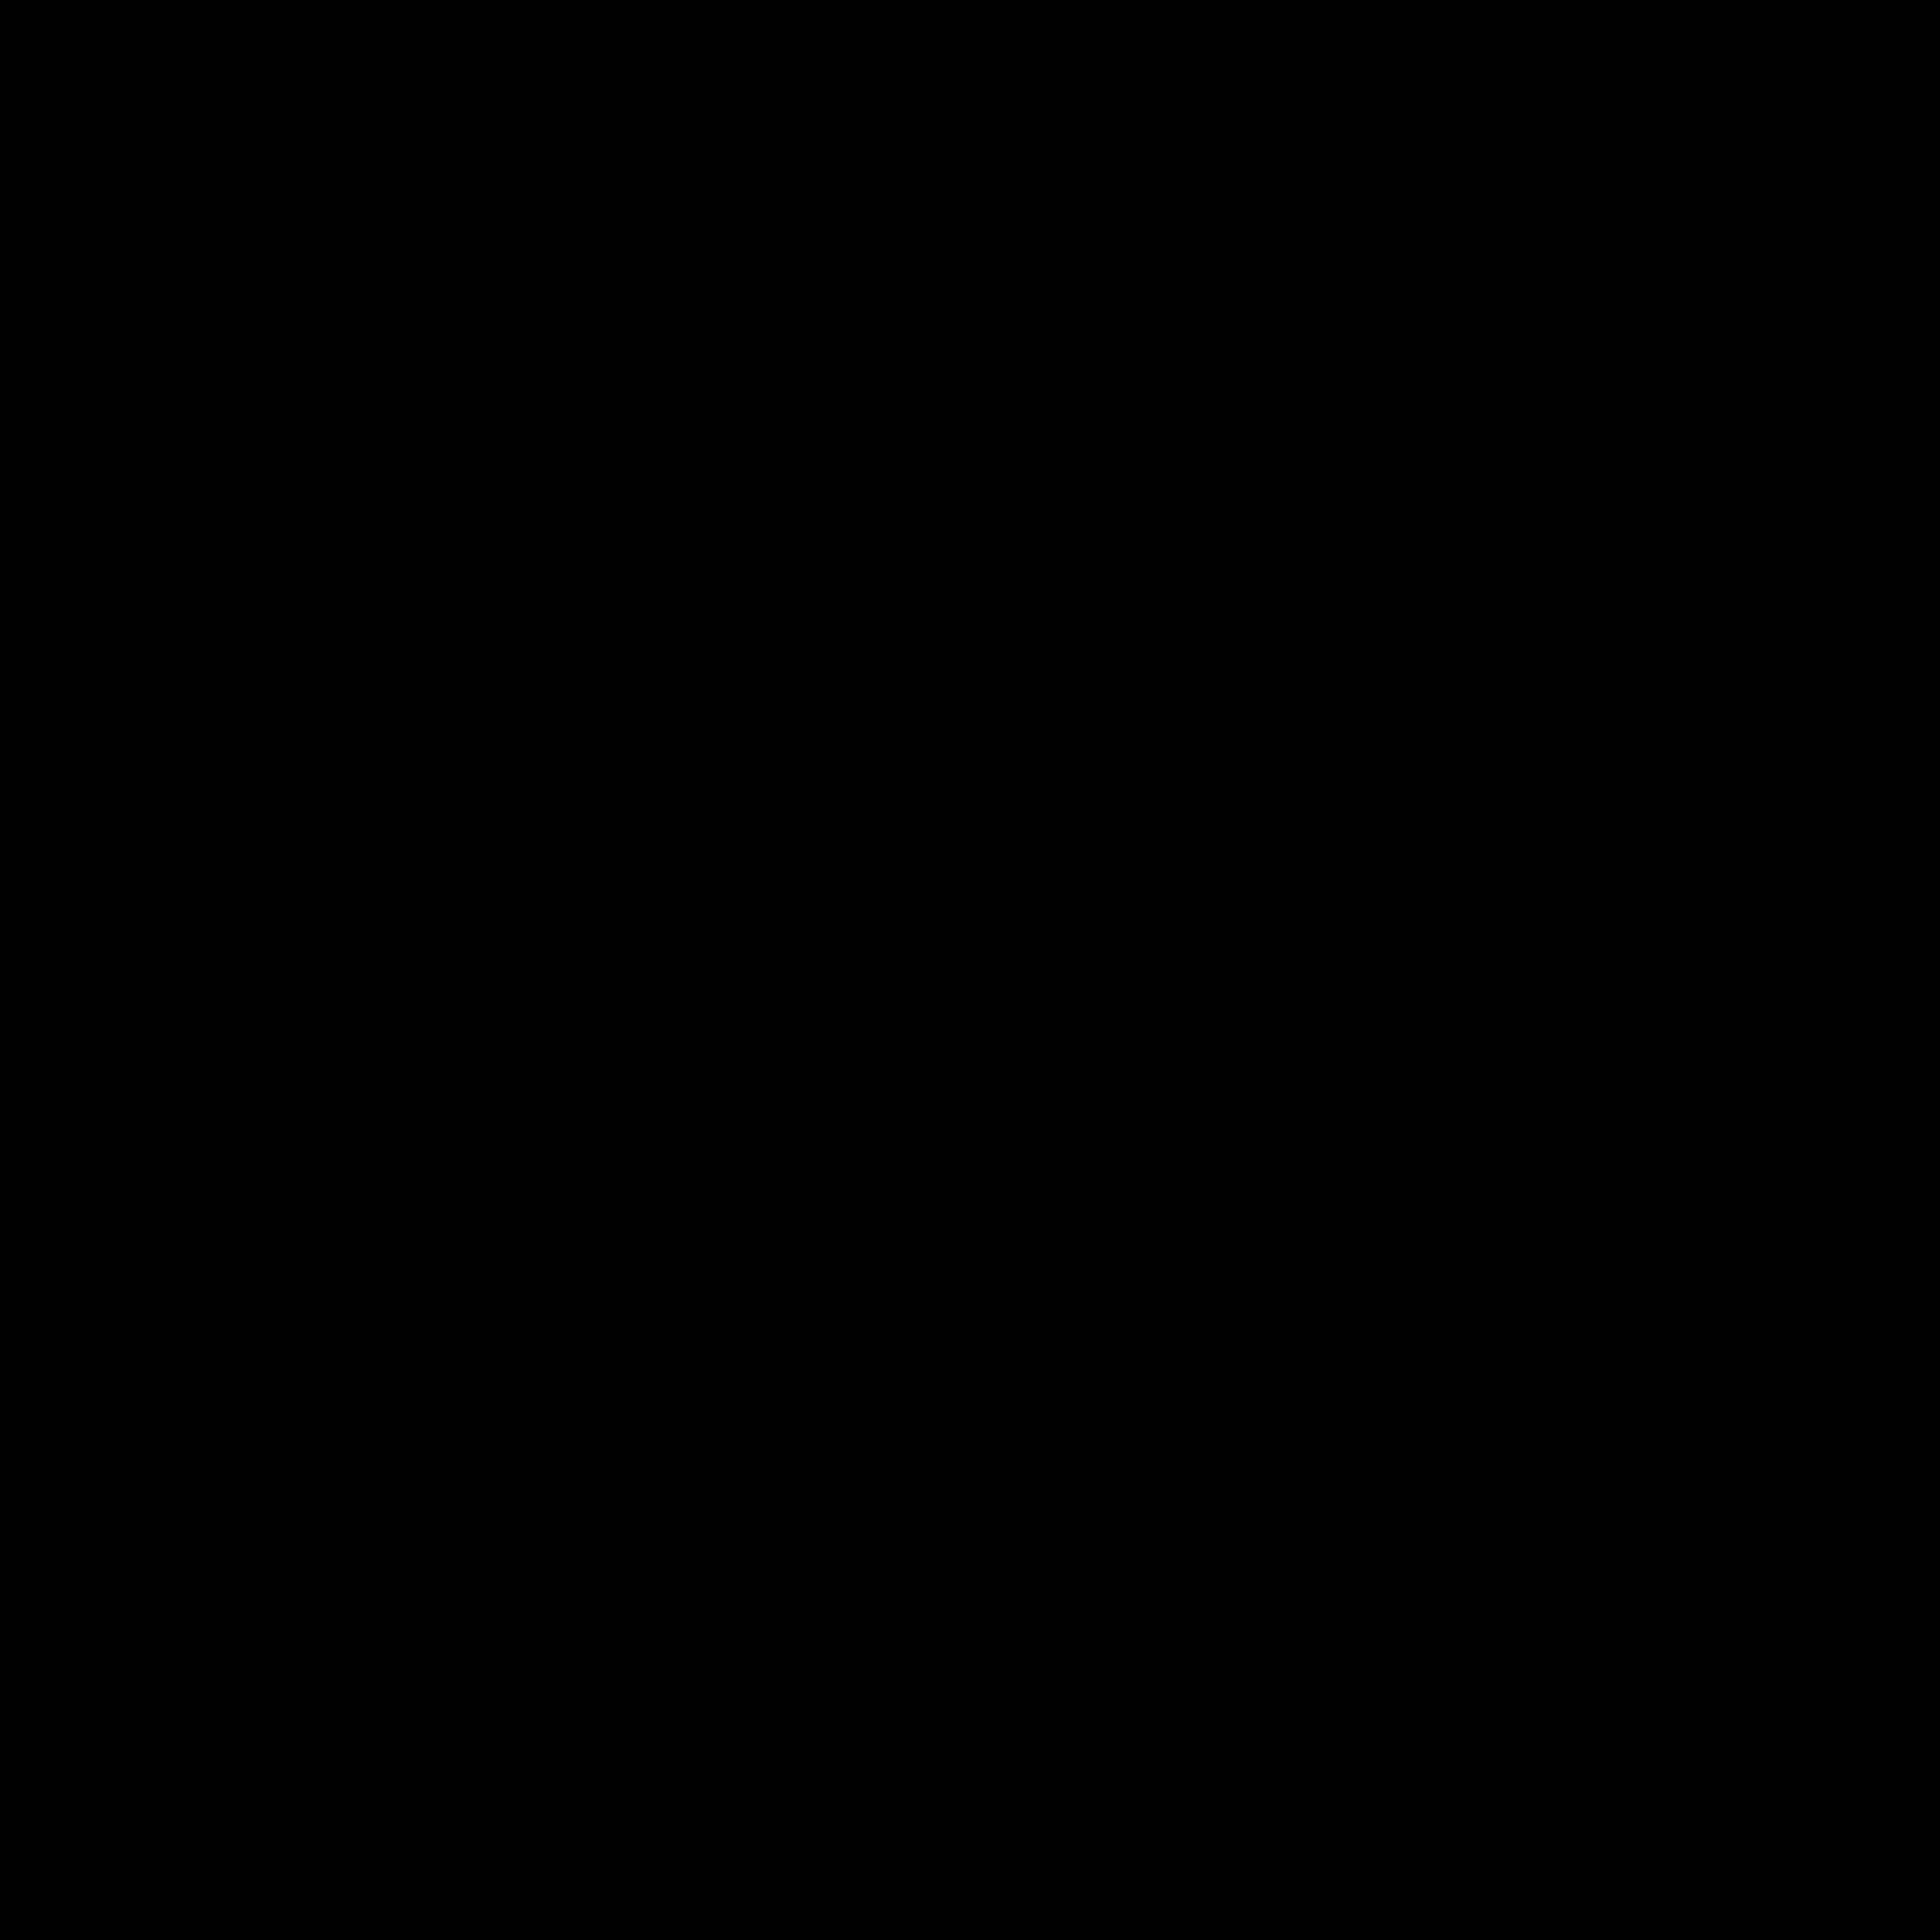 Logo-vector-black.png